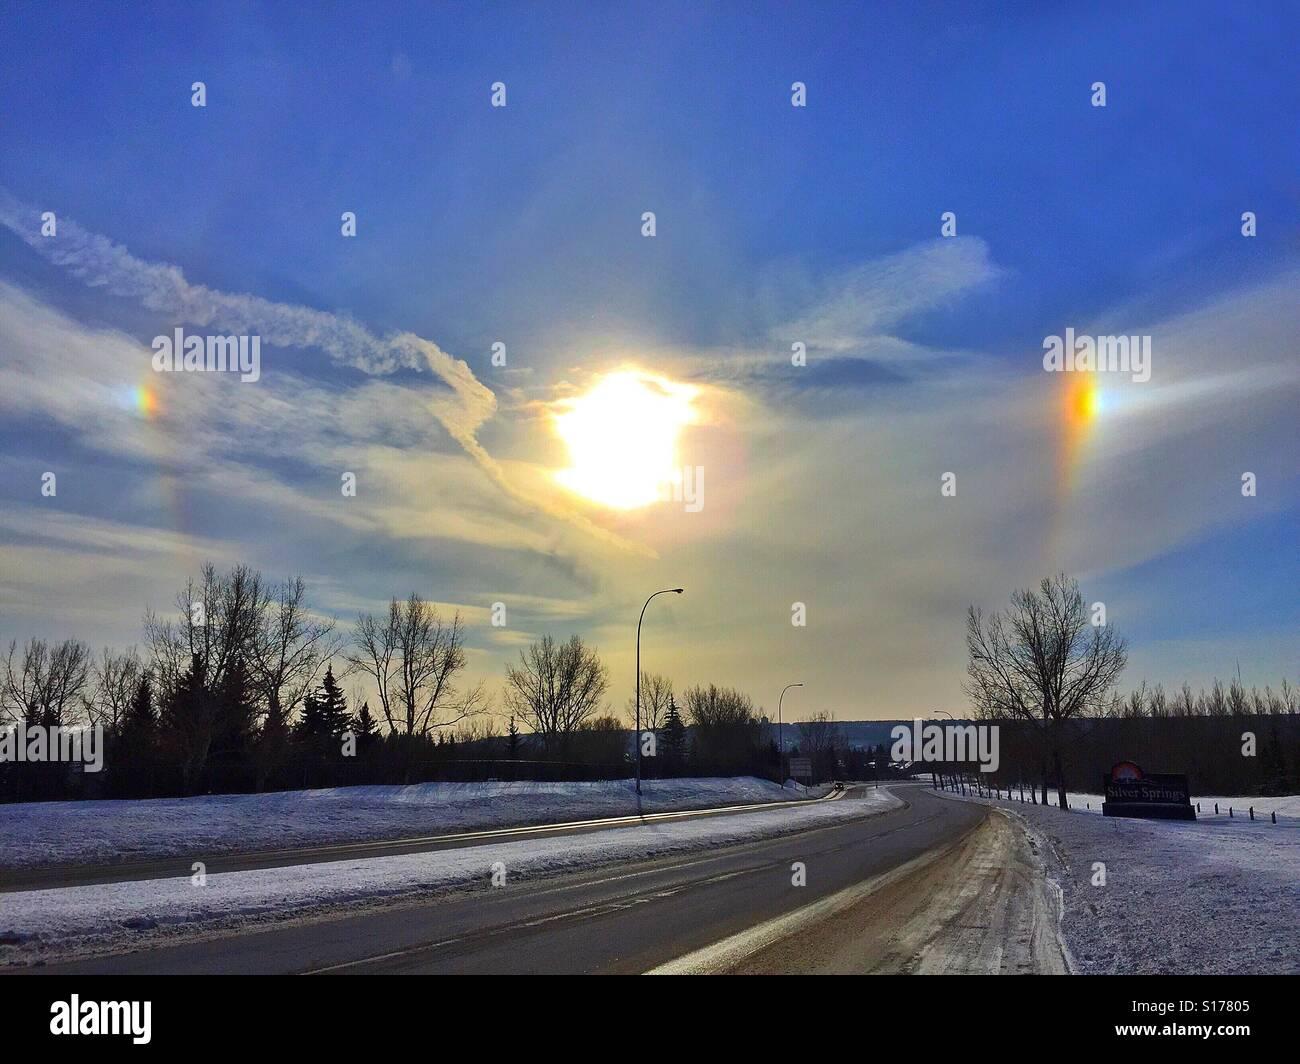 Bright sun,sun dogs, and jet stream - Stock Image